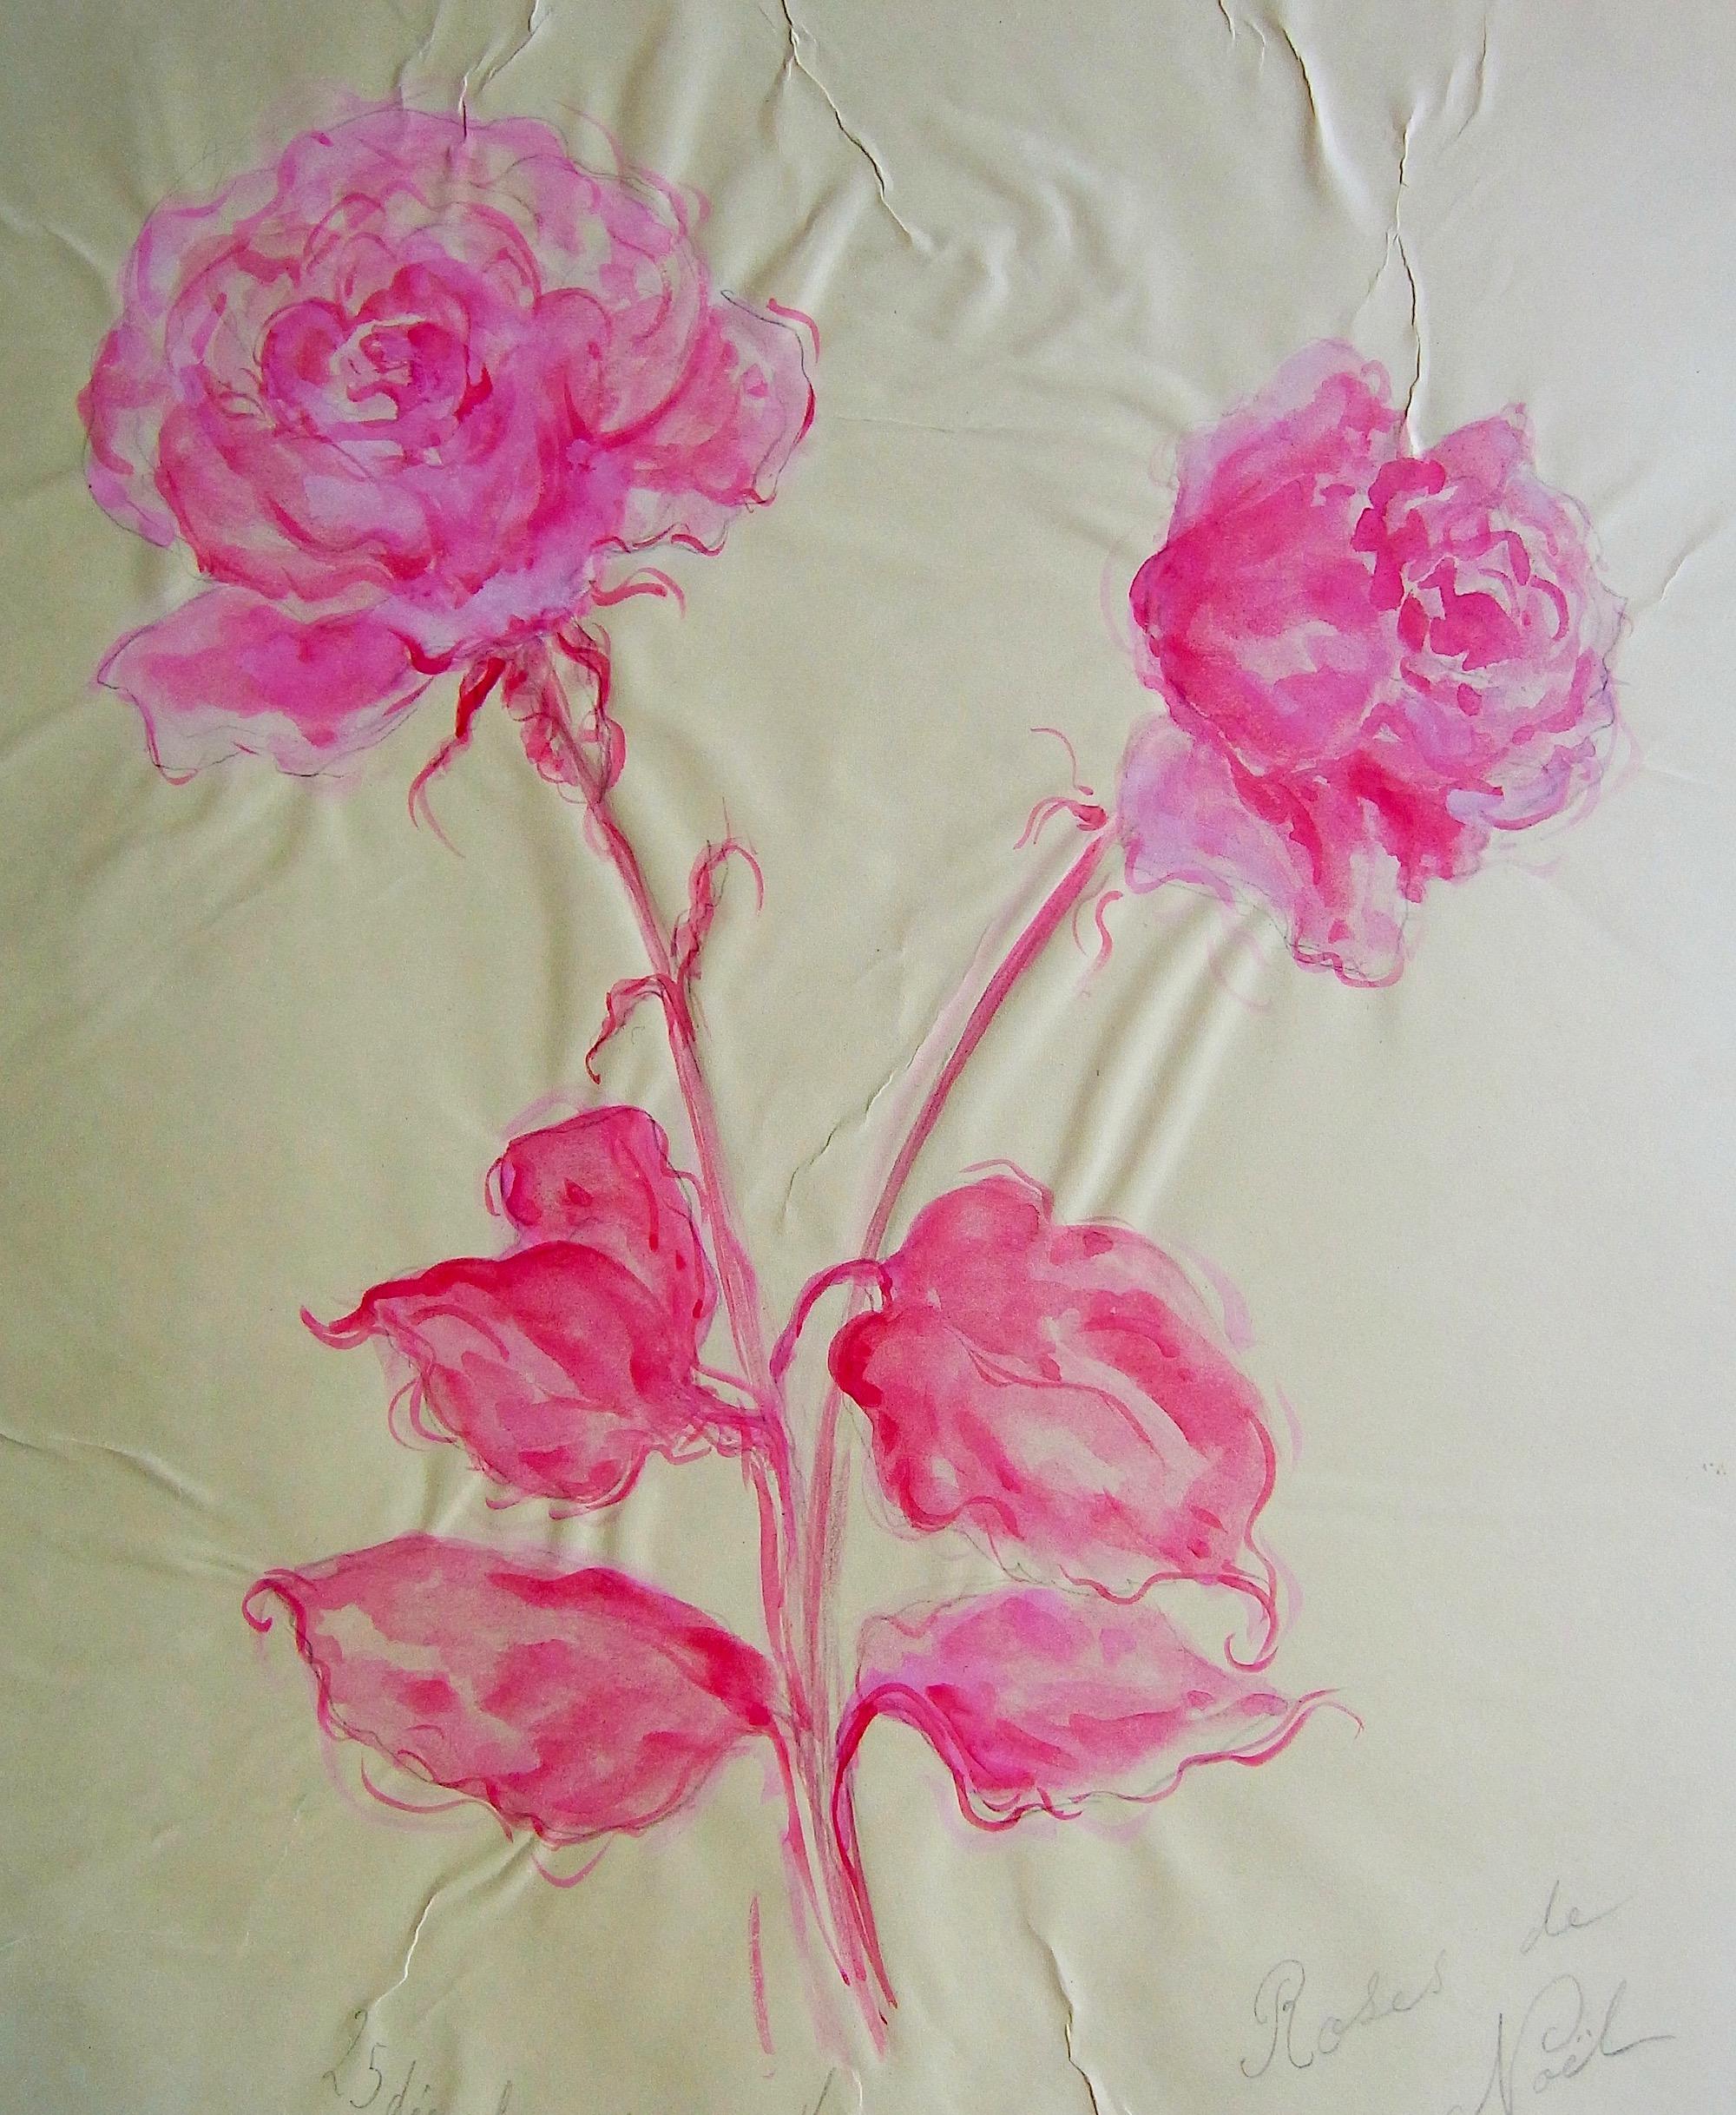 MAMI / Images et Poésie, Roses Collection